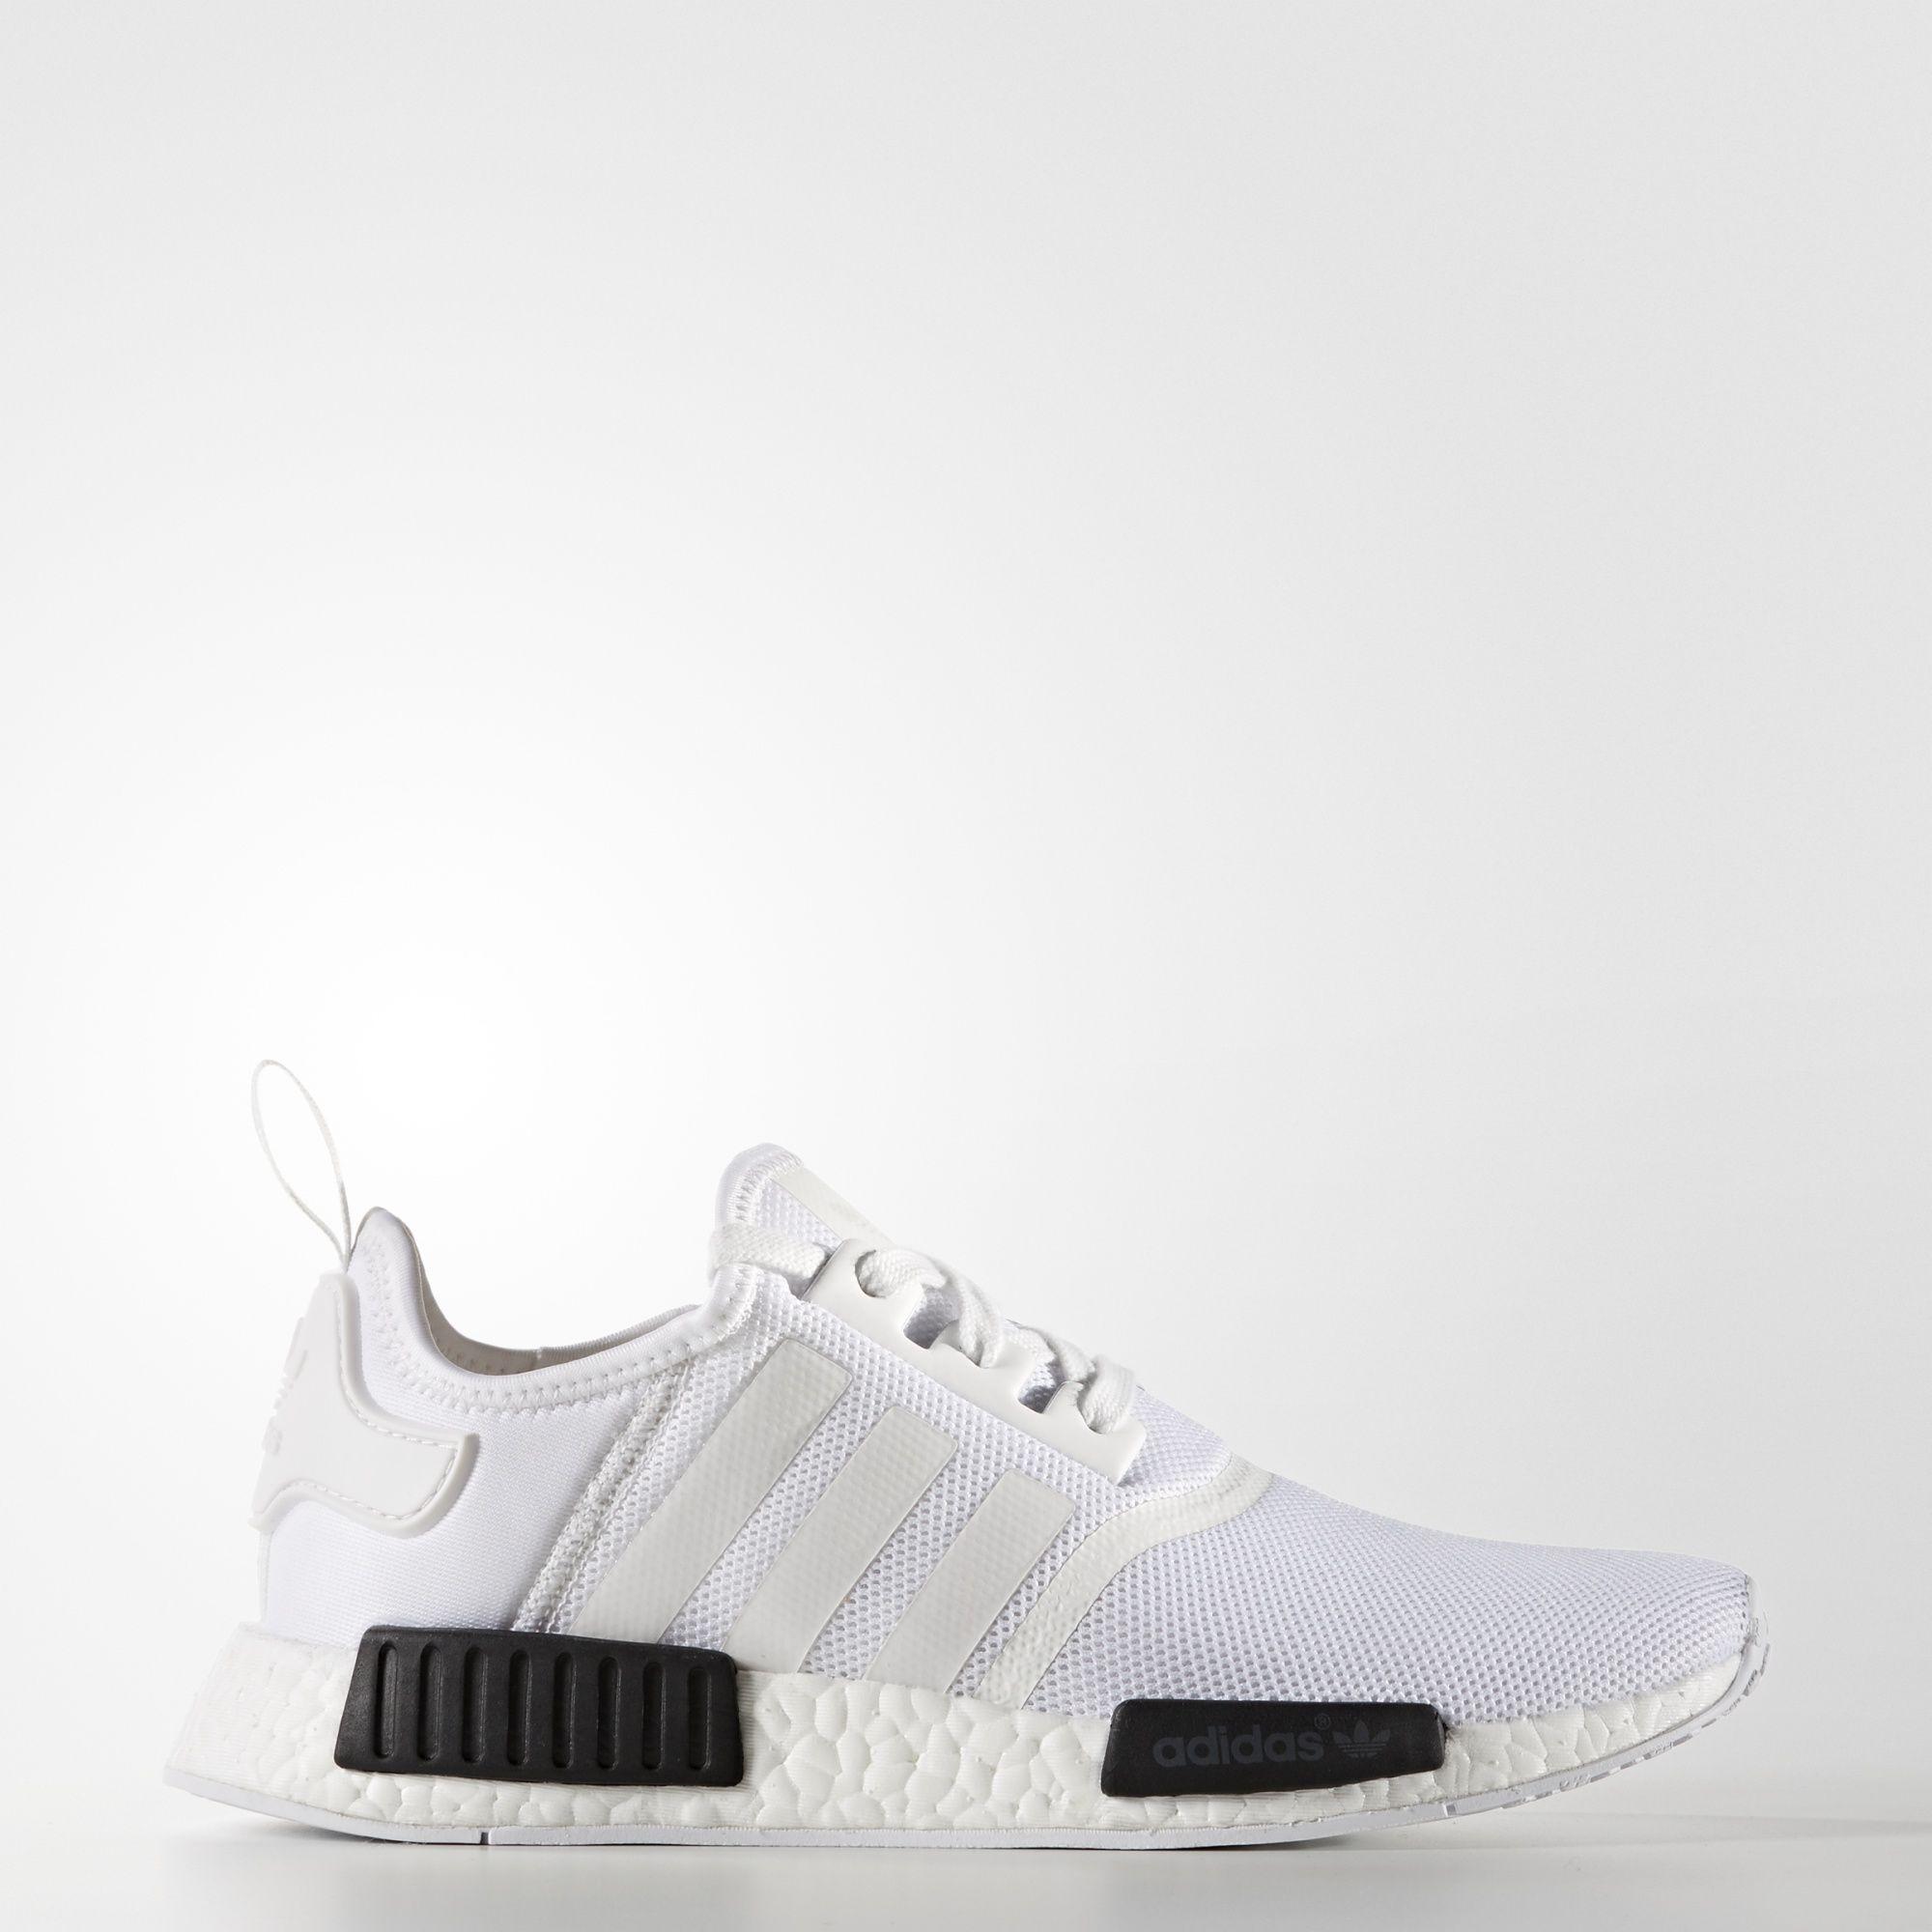 the latest 7e076 6adb5 shopping adidas nmd r1 white core black womens fashion shoes on carousell  8ac72 05273